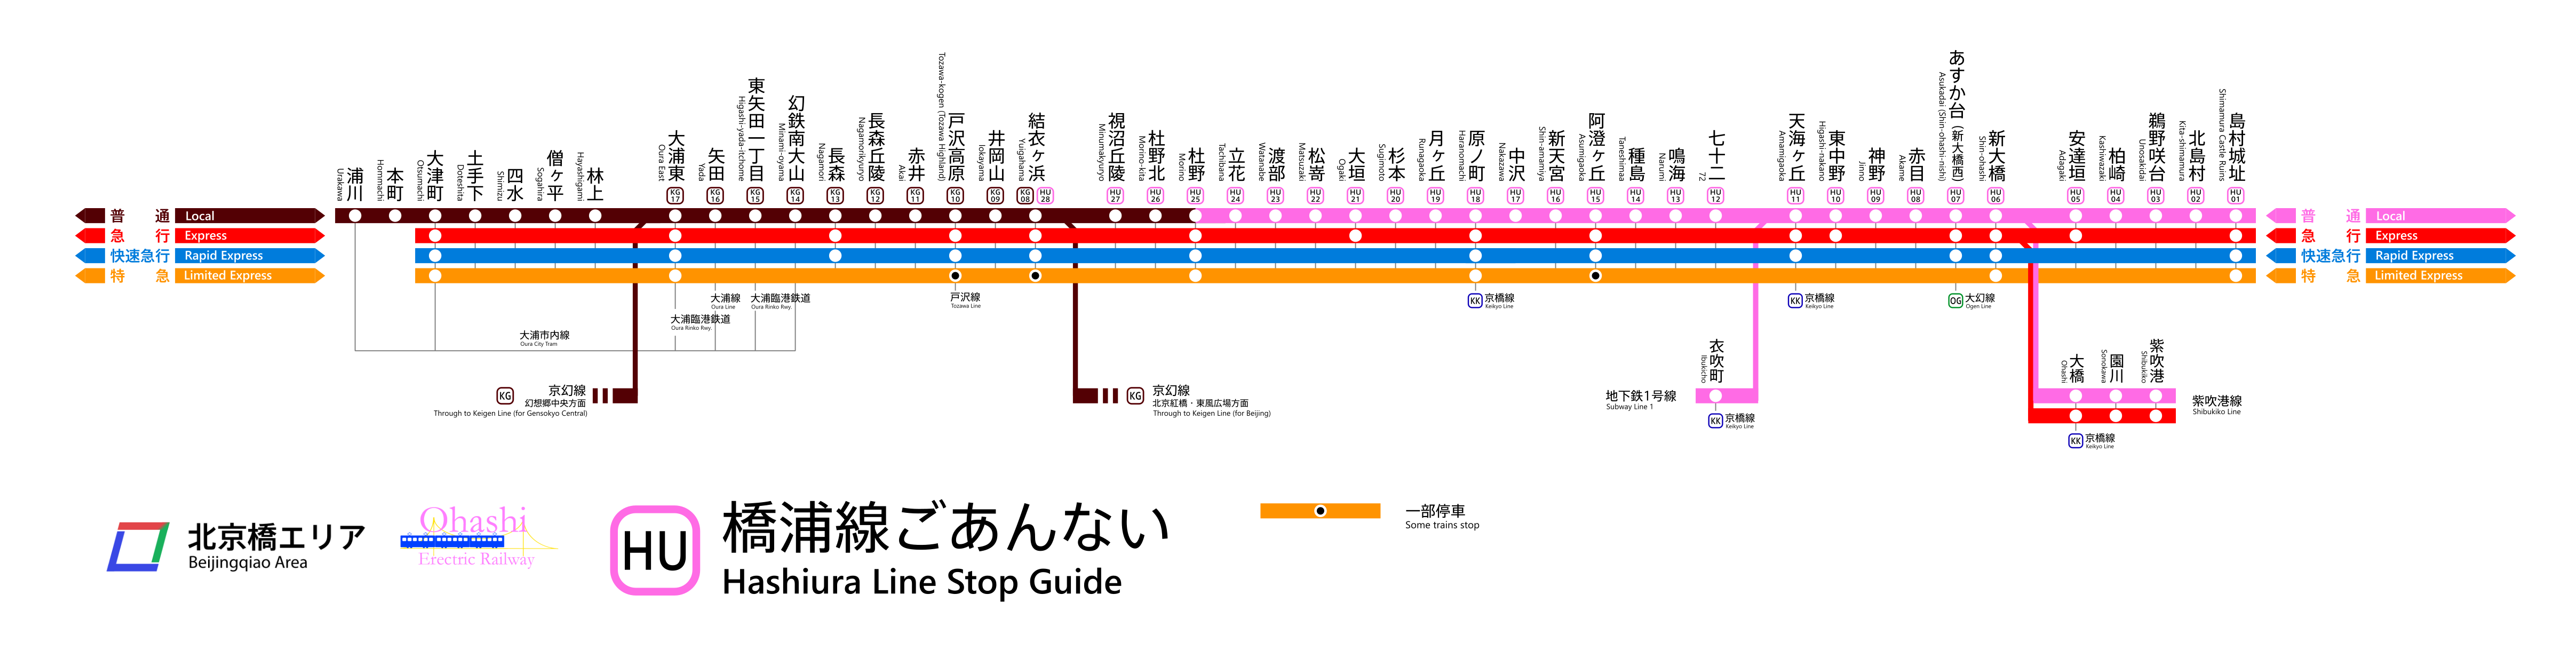 橋浦線202005.png